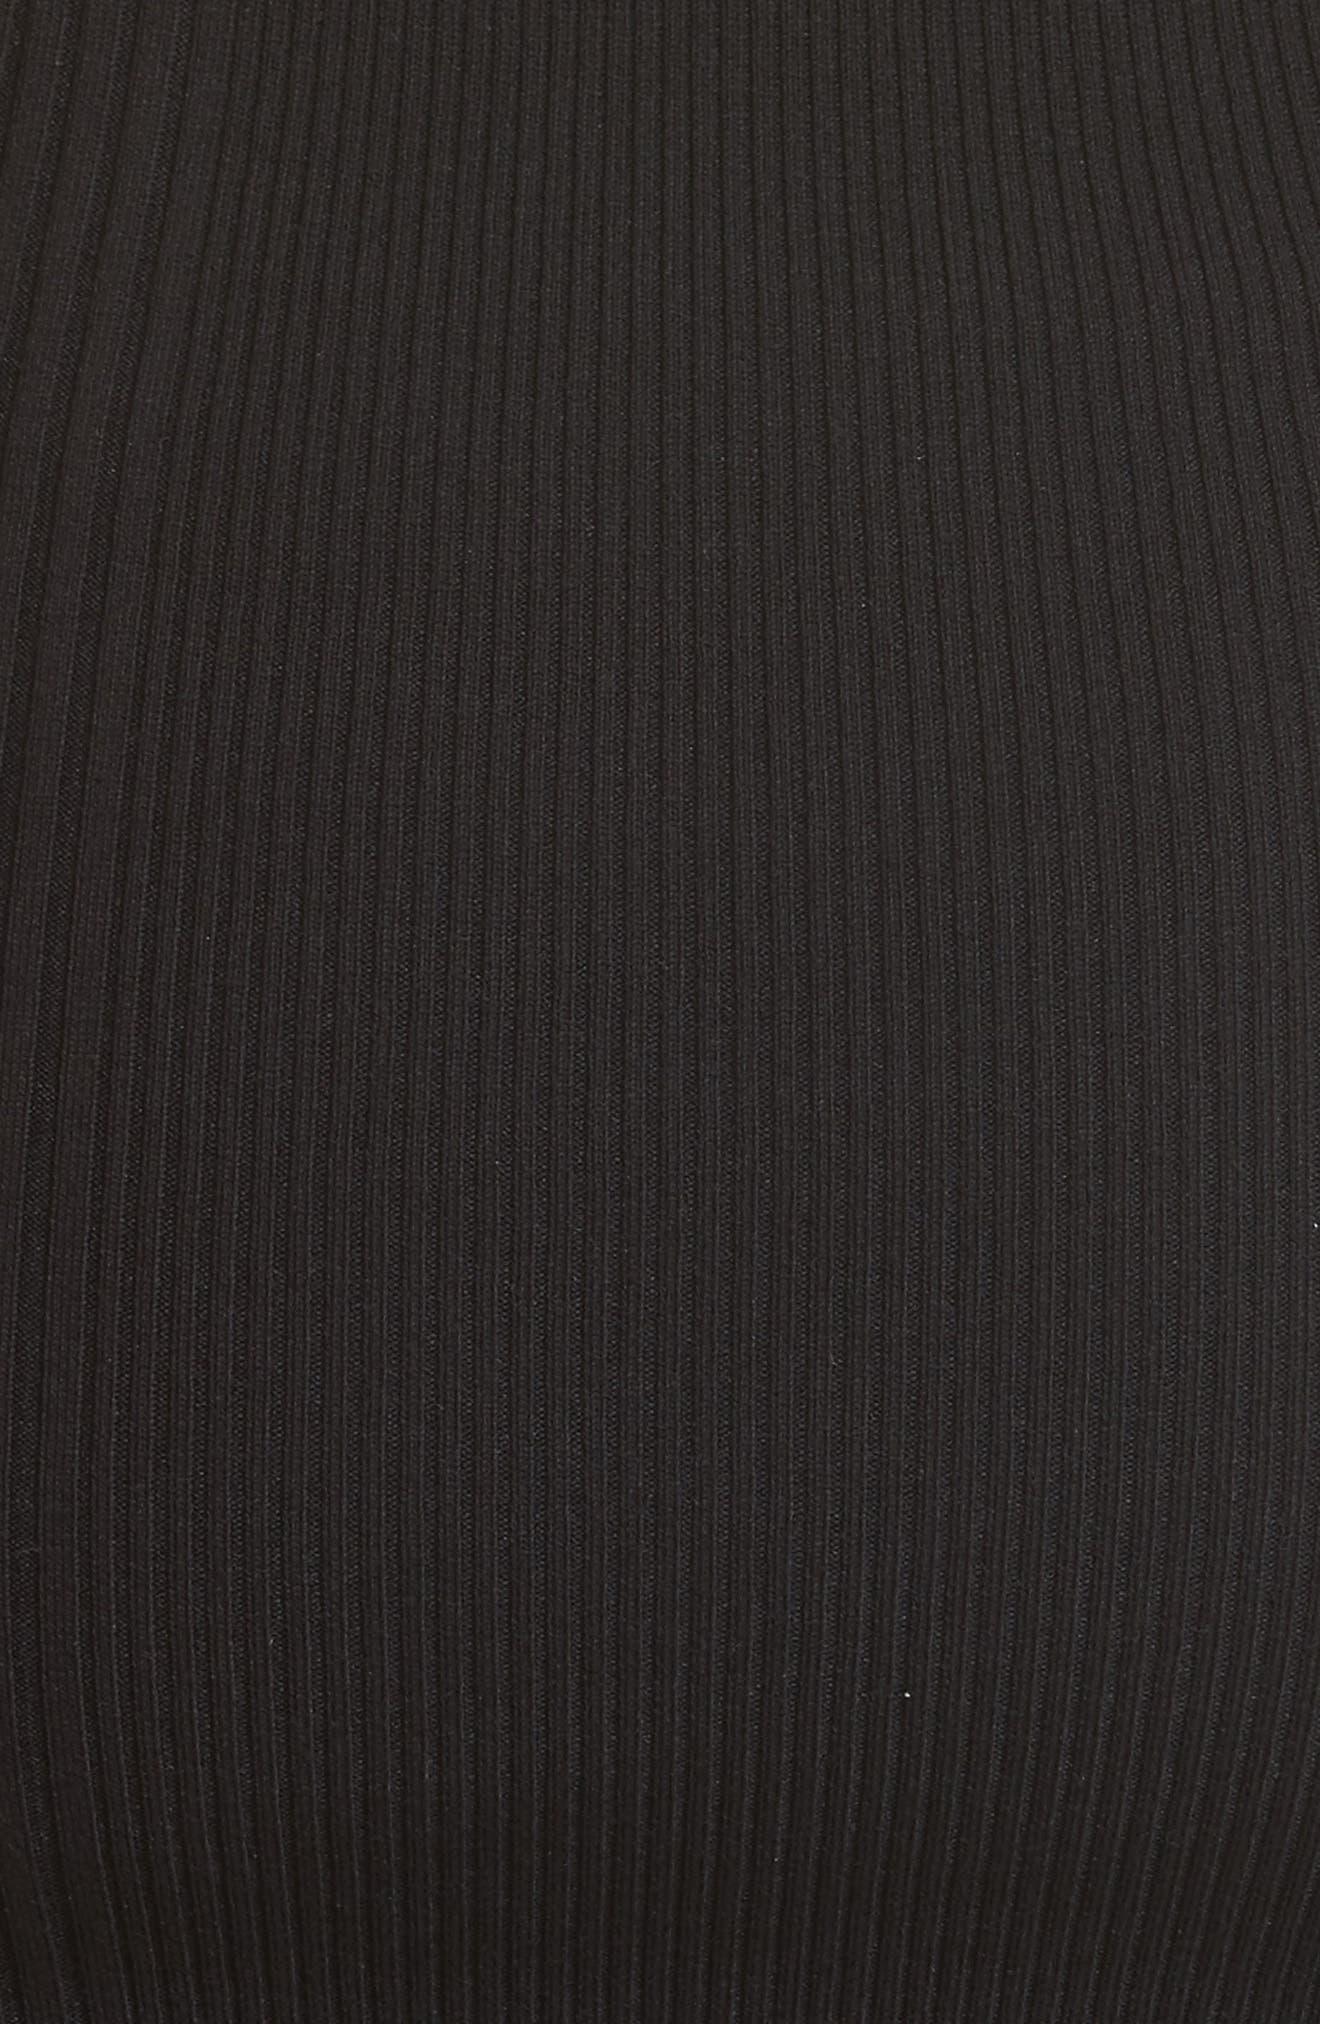 Sheer Popover Knit Dress,                             Alternate thumbnail 6, color,                             Black